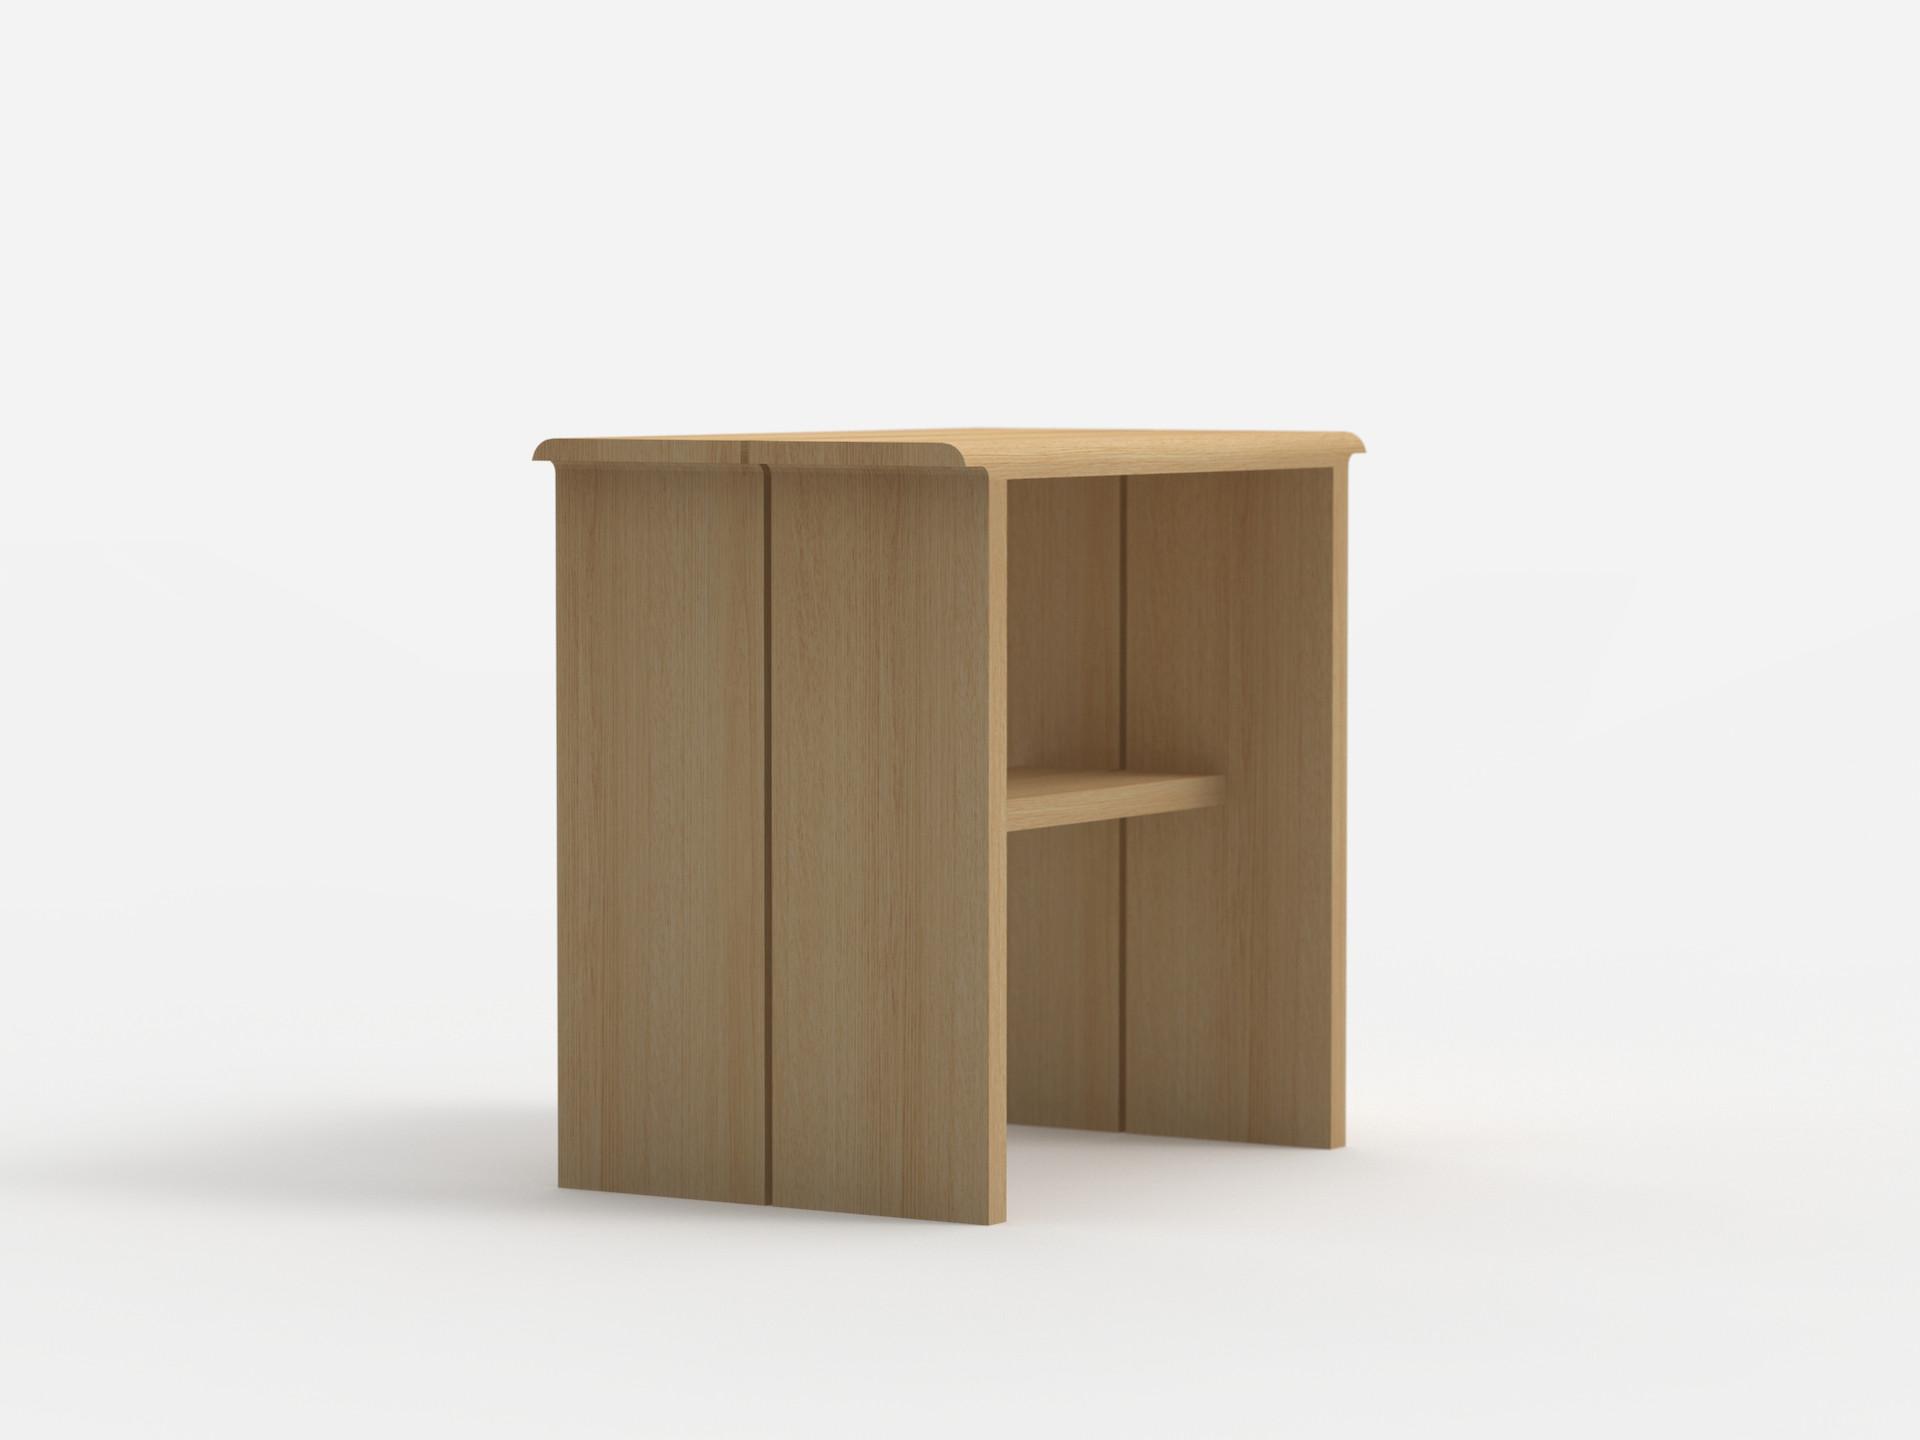 200516_stool_6.jpg